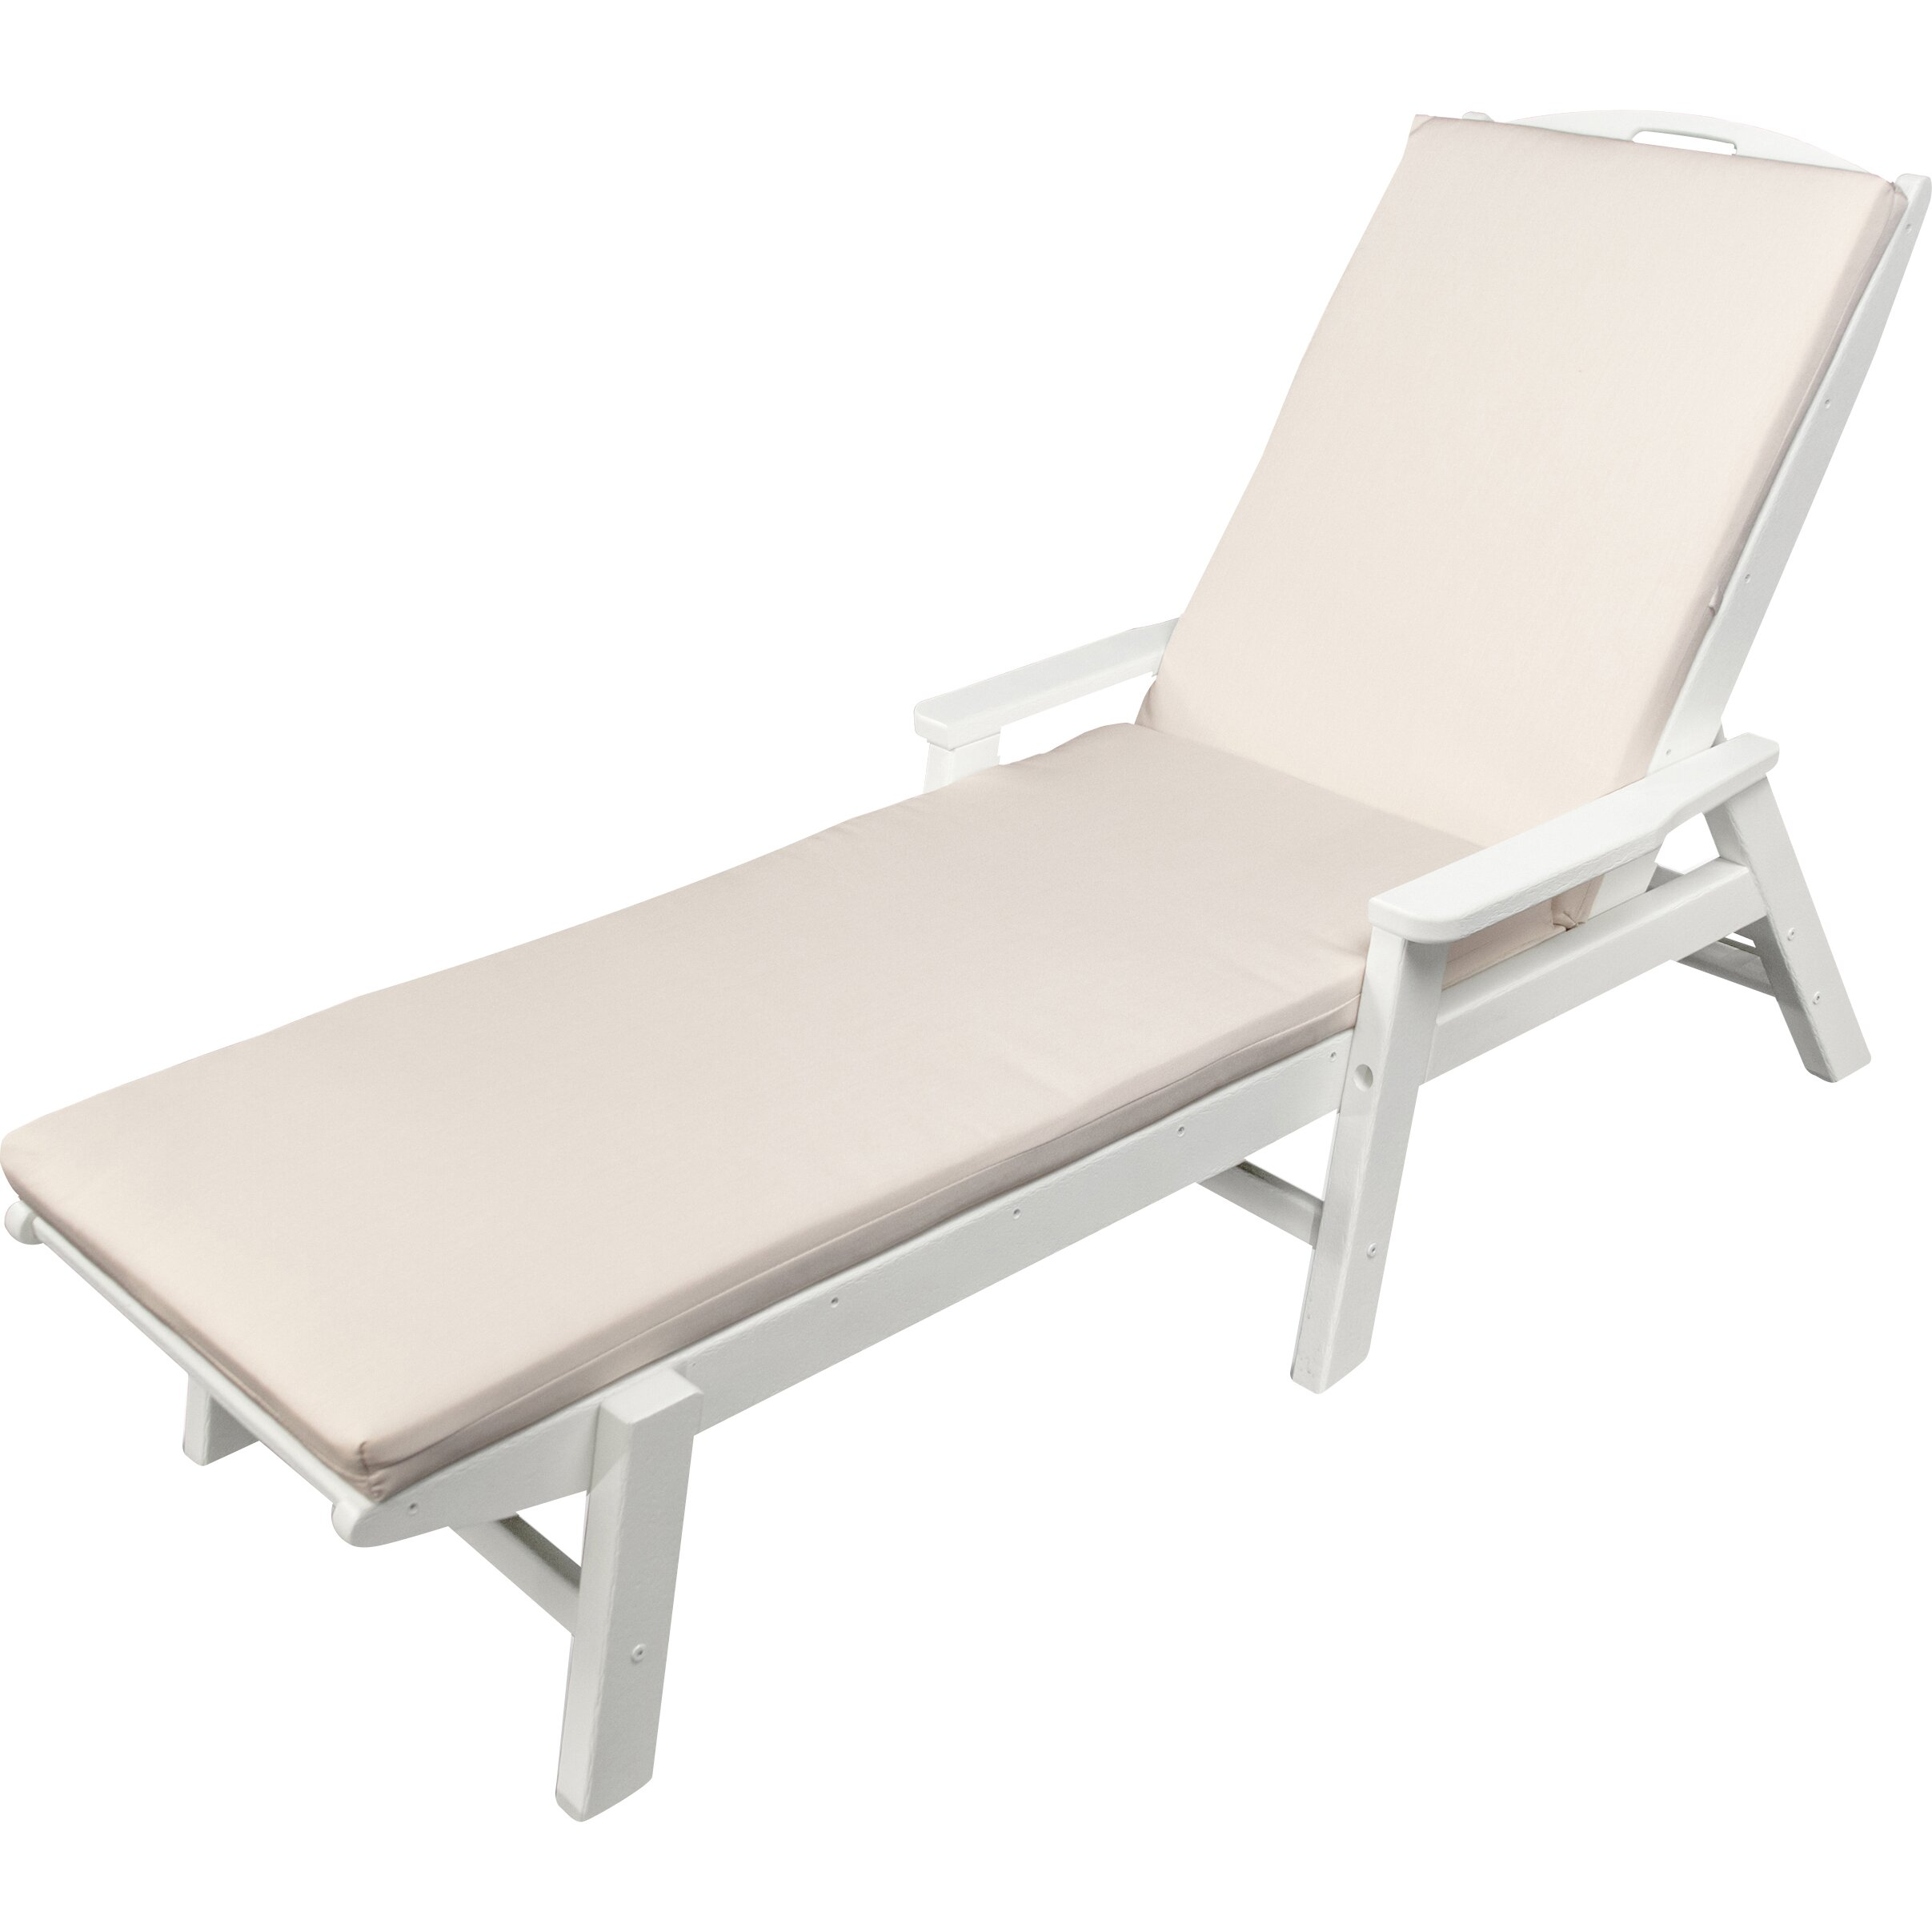 Ateeva outdoor sunbrella chaise lounge cushion reviews for Chaise lounge cushion covers outdoor